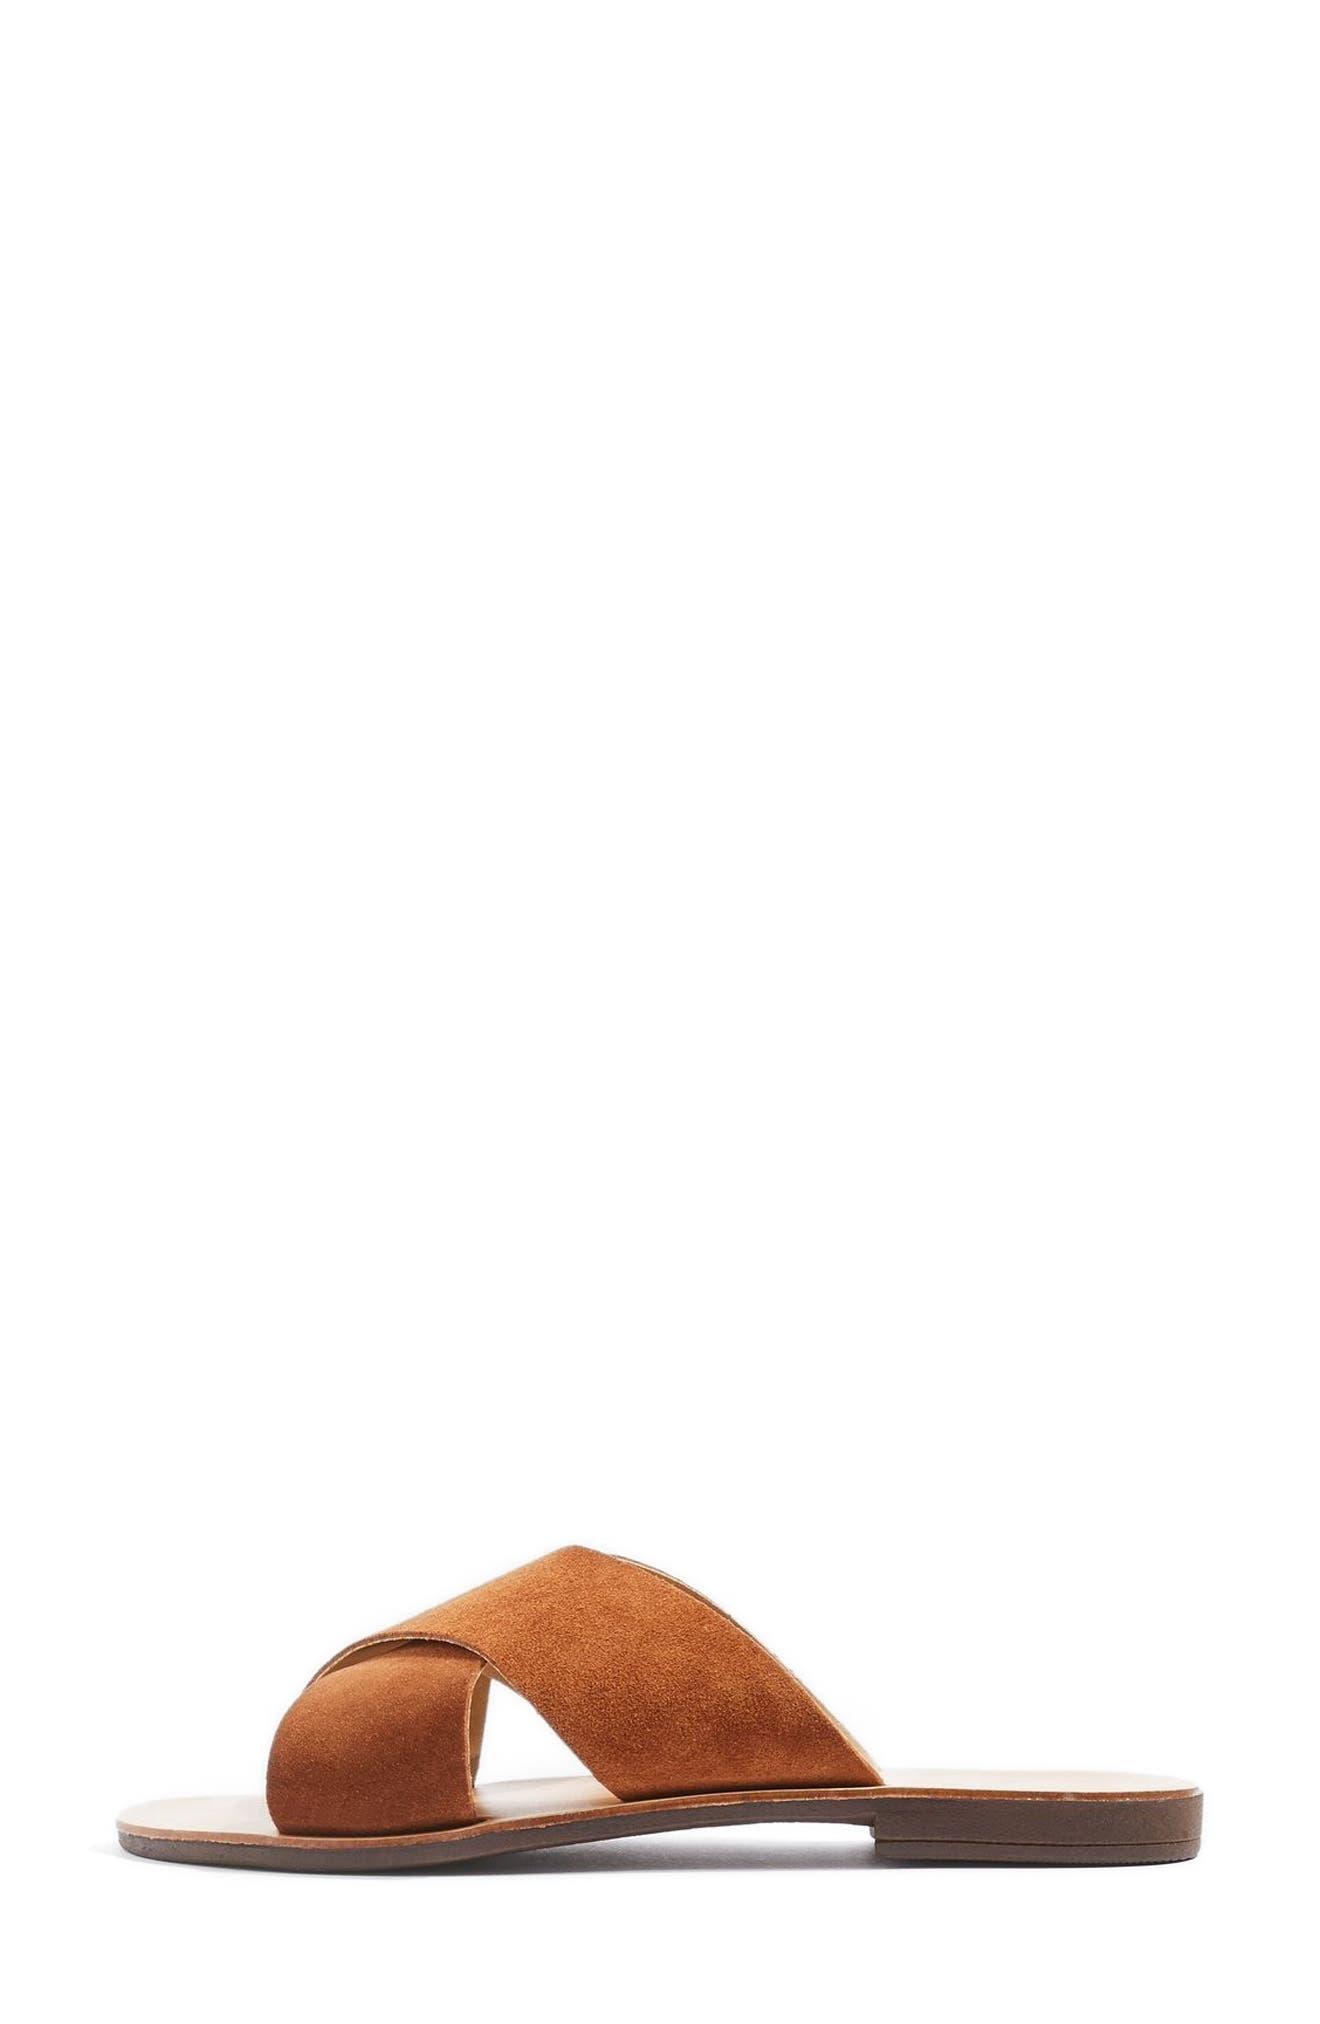 Hawaii Crisscross Sandal,                             Alternate thumbnail 10, color,